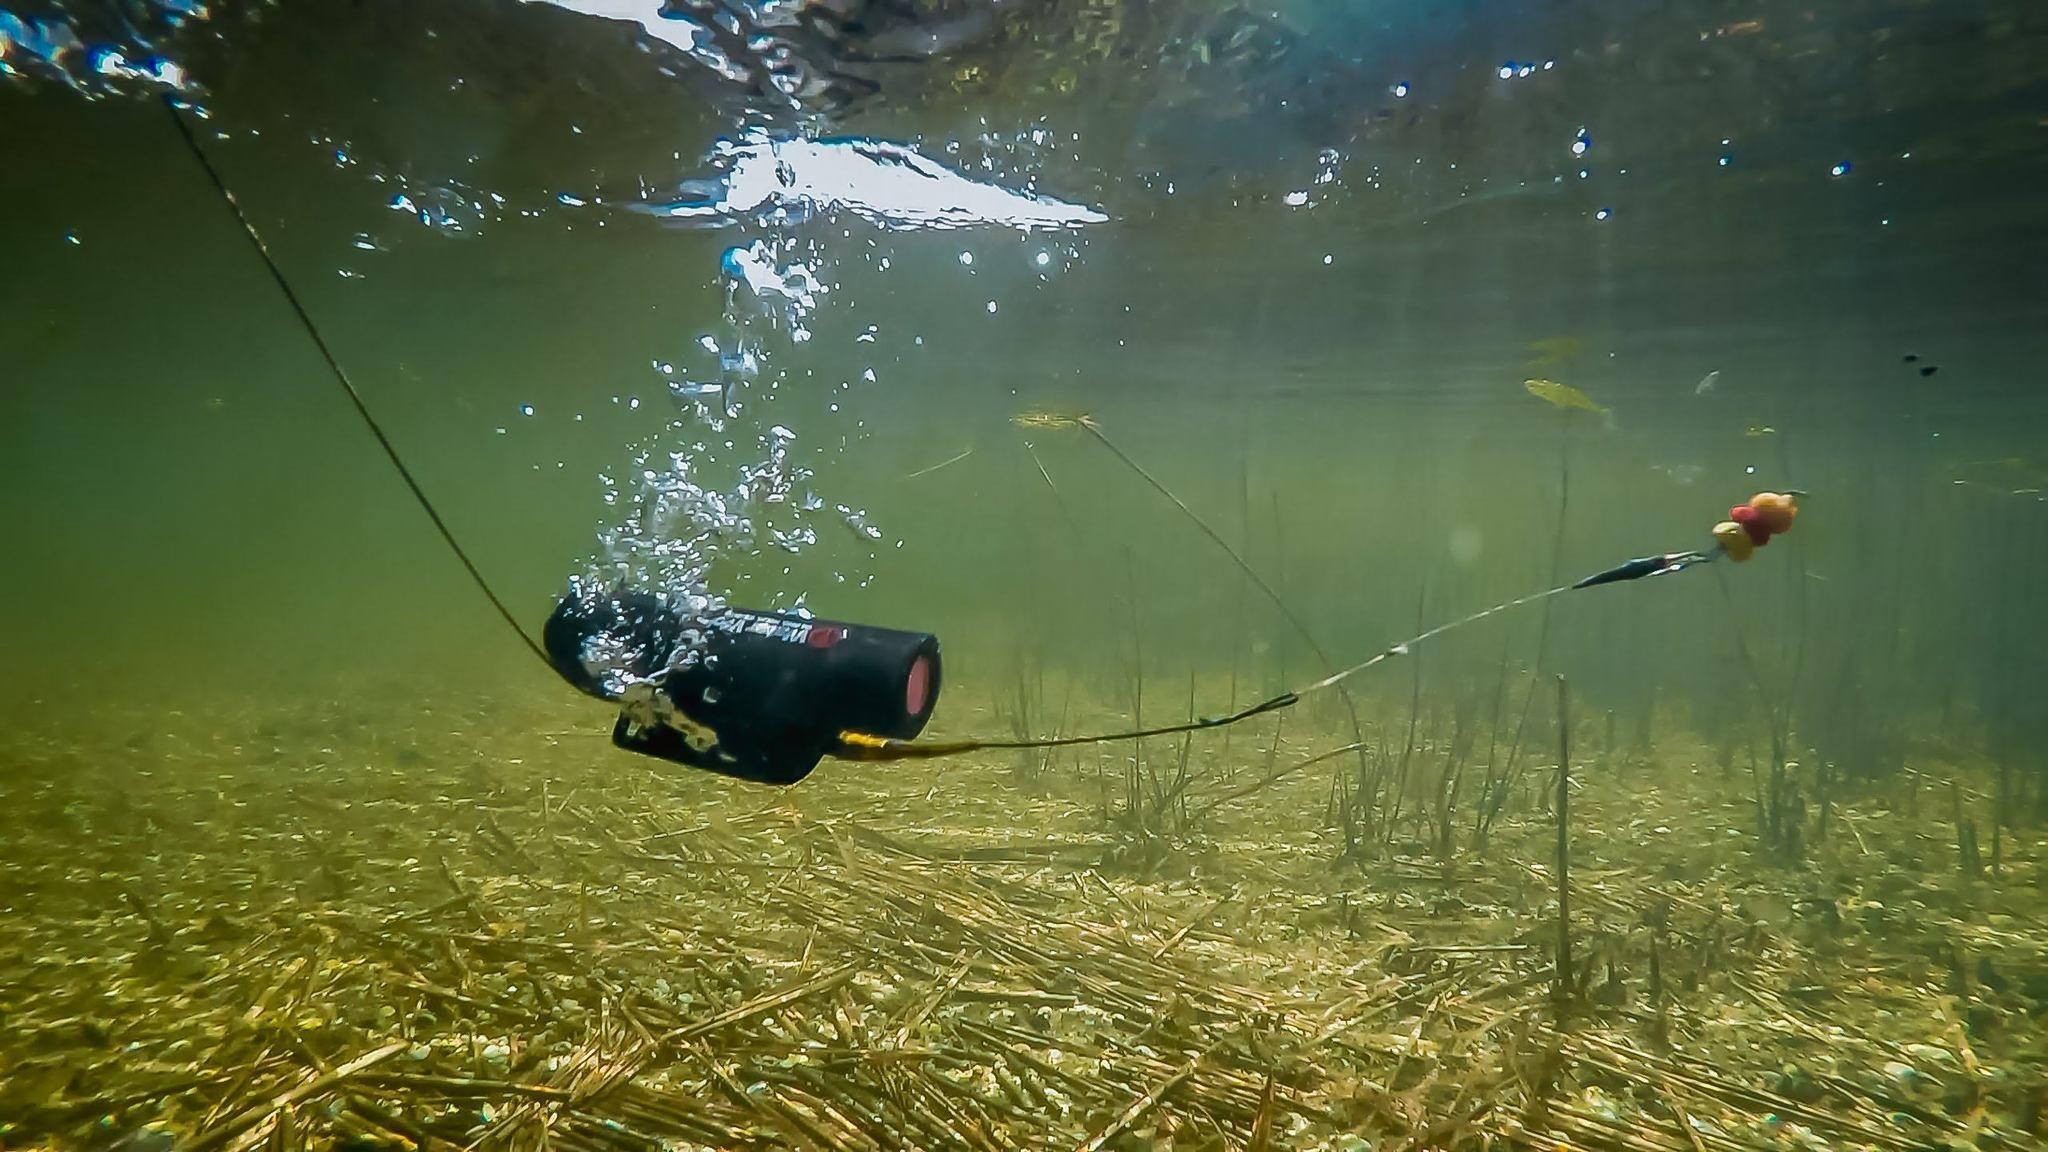 The 5 best underwater fishing camera in 2018 for Underwater fish camera